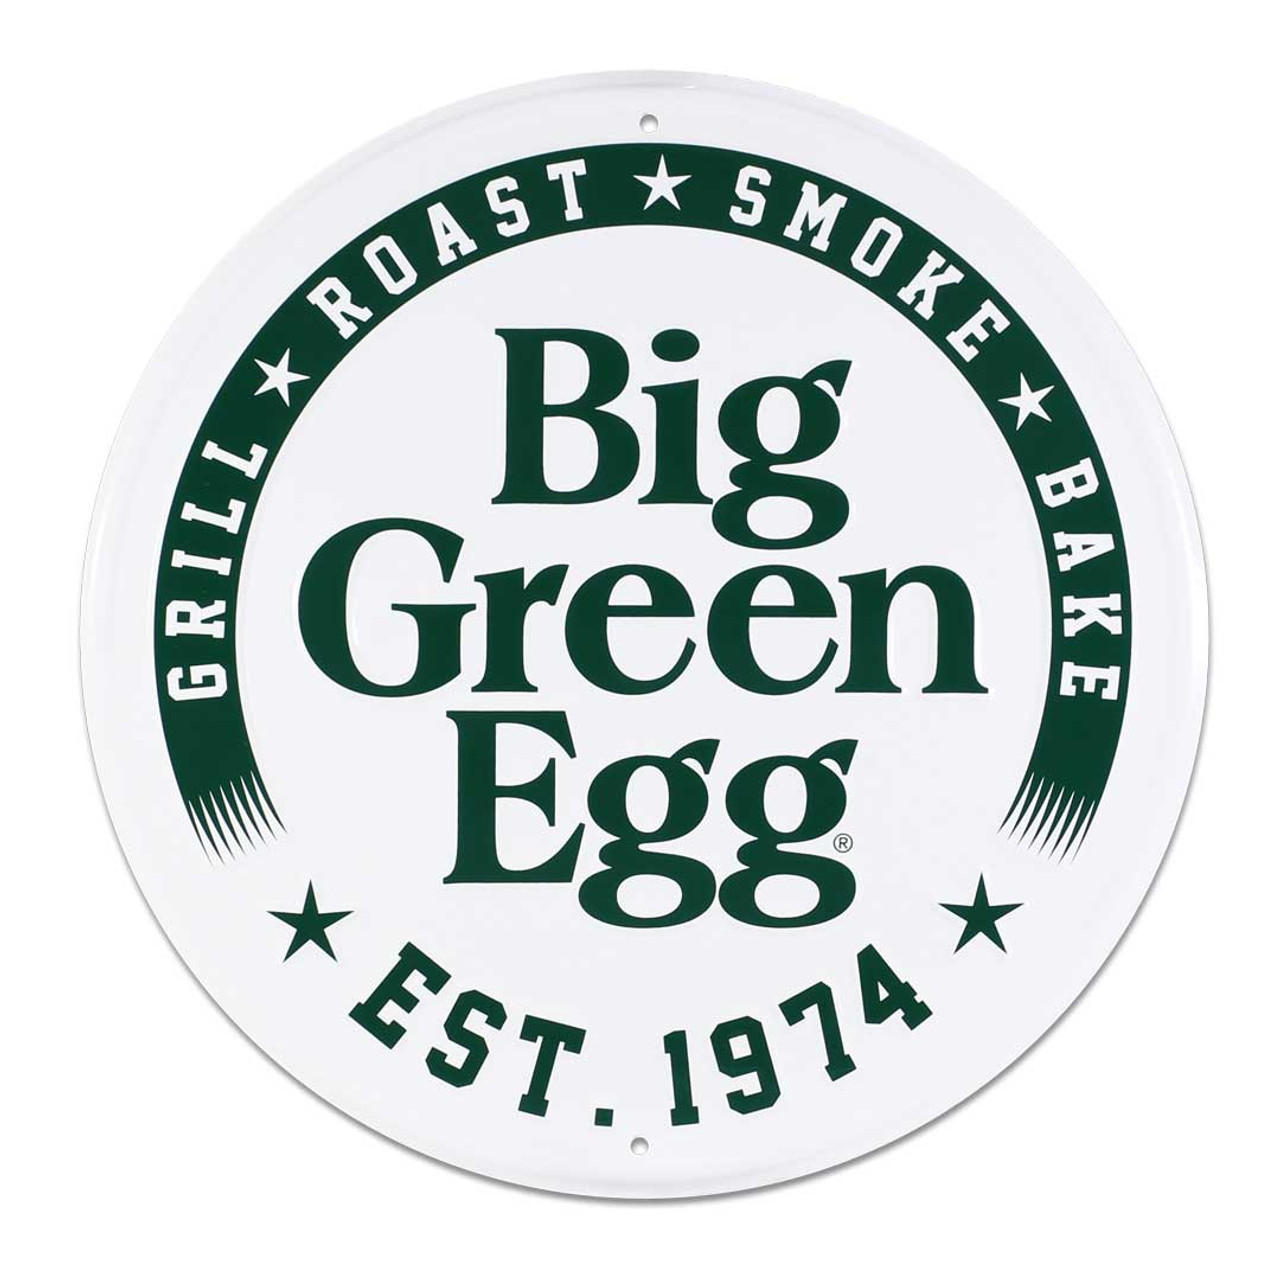 Round Stamped Aluminum Est. 1974 Sign, White Big Green Egg Sign